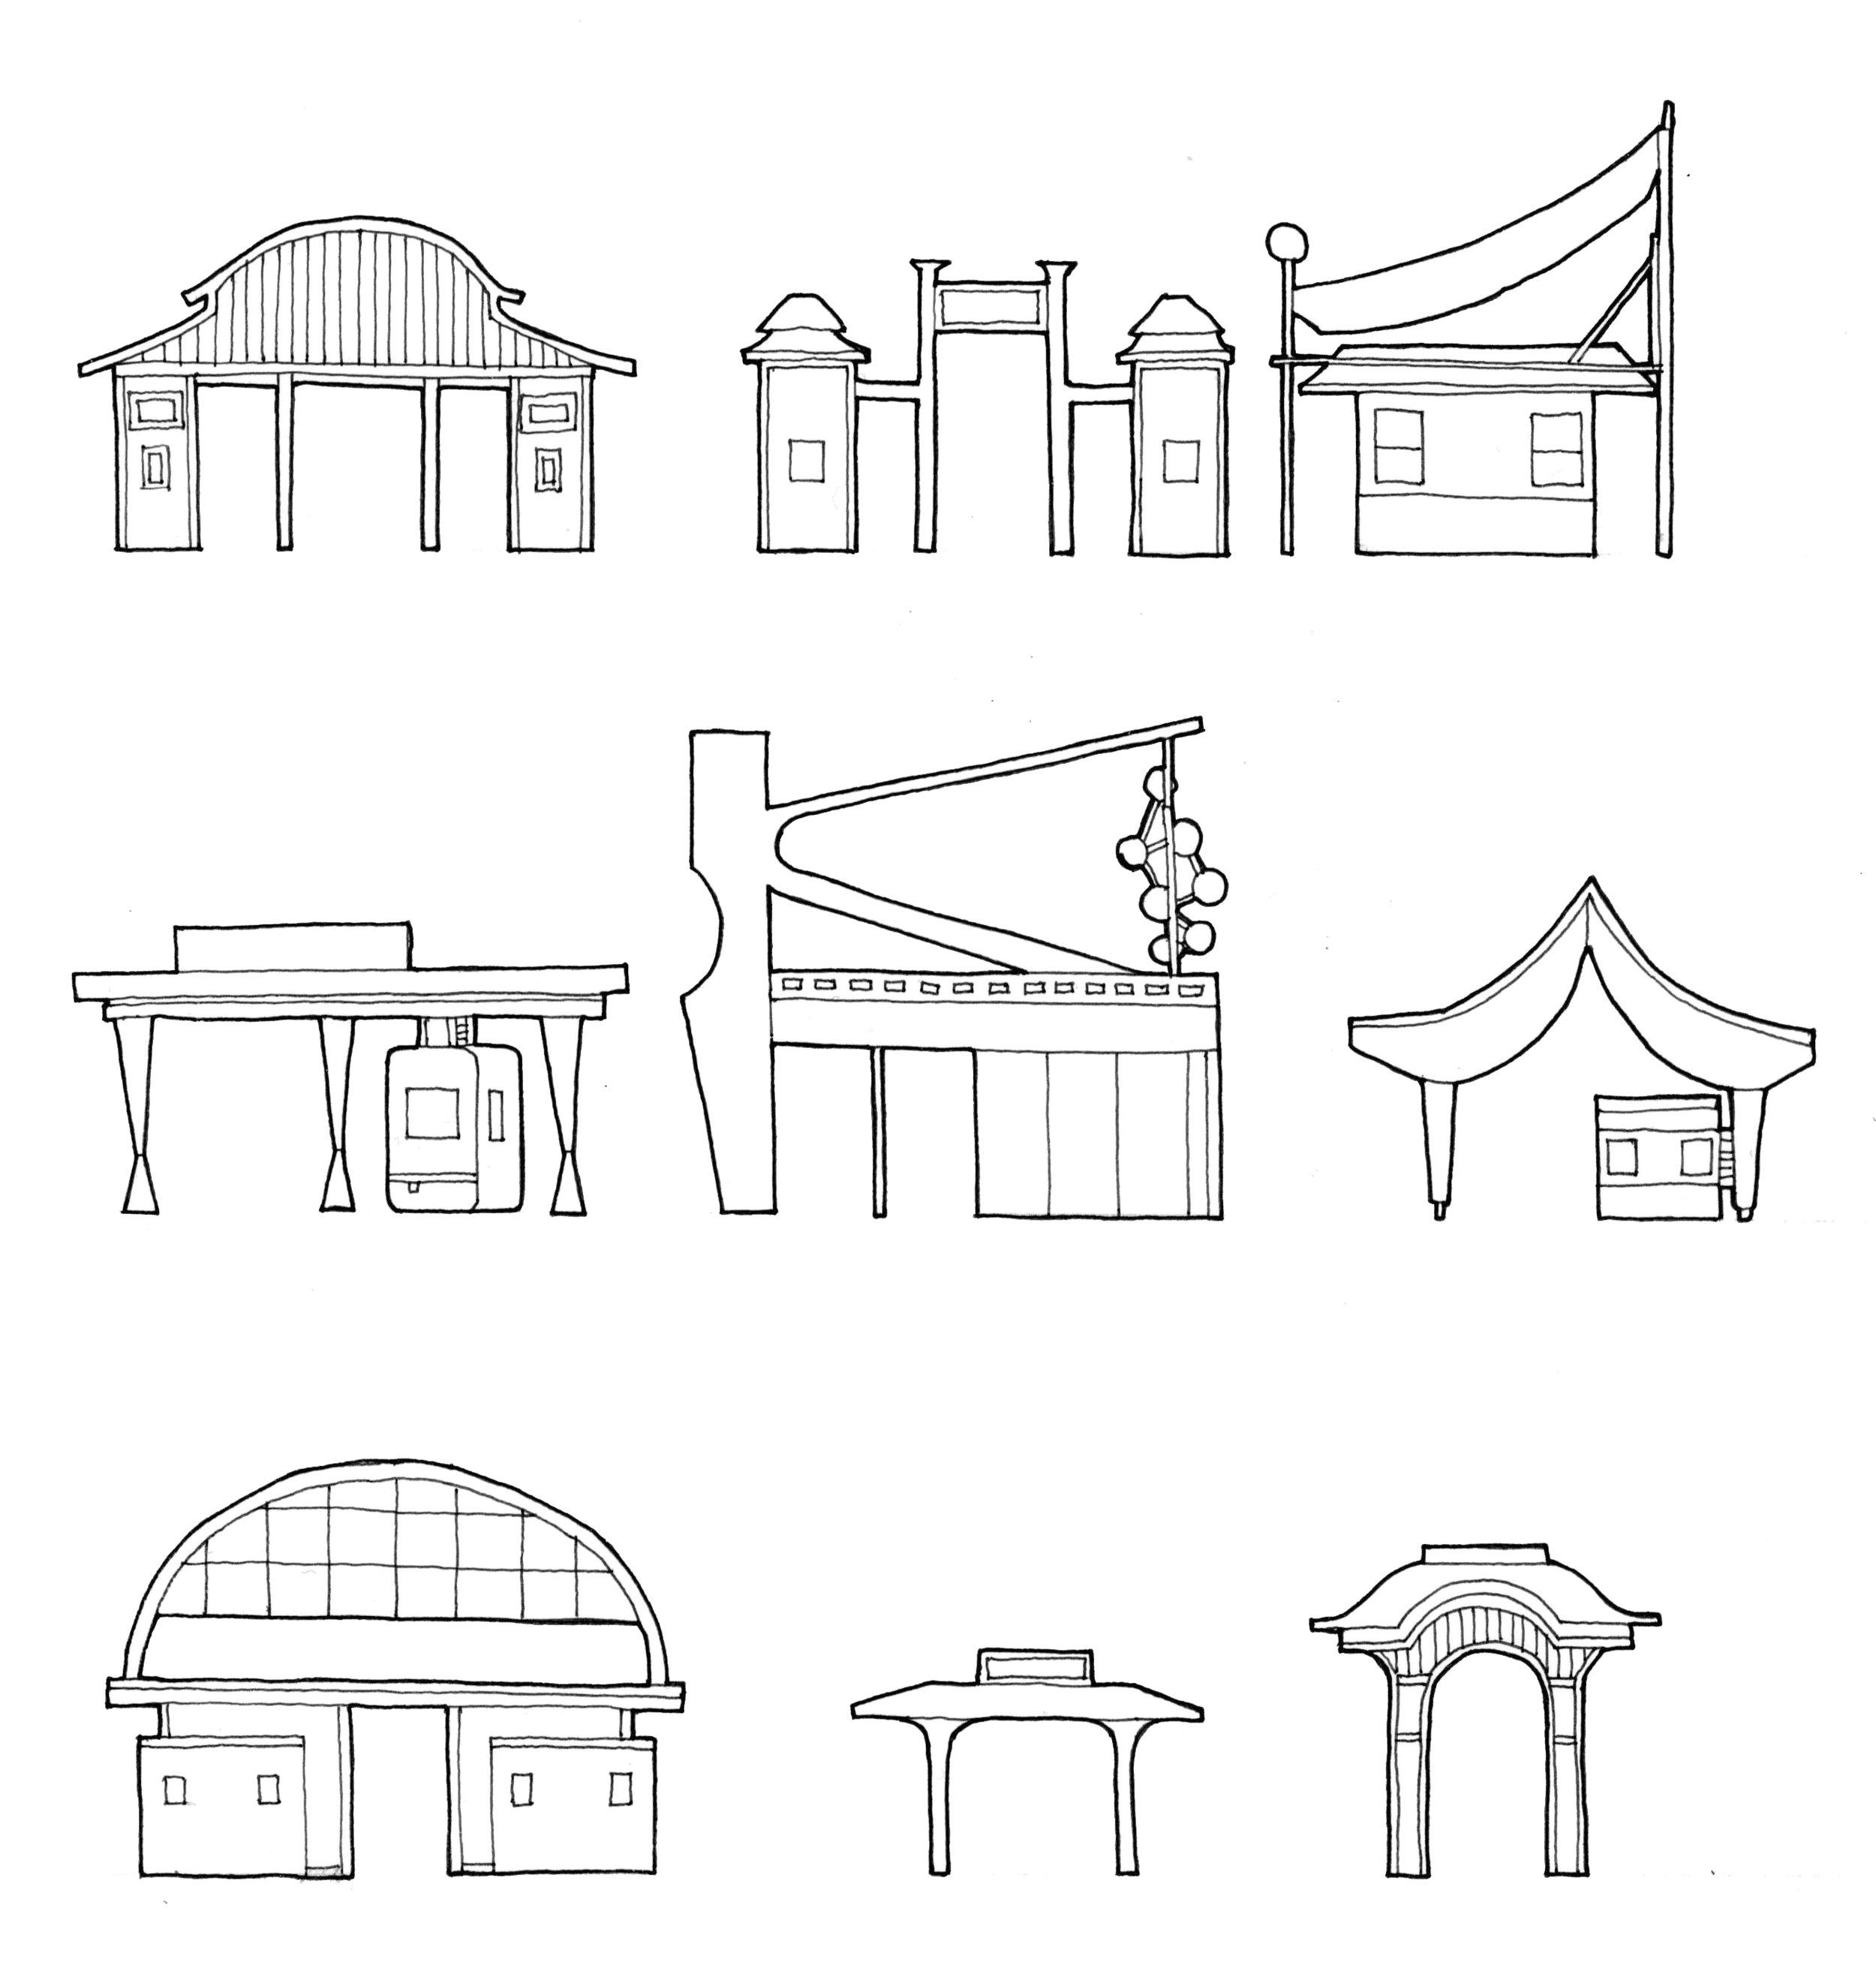 TypologySketch01.jpg